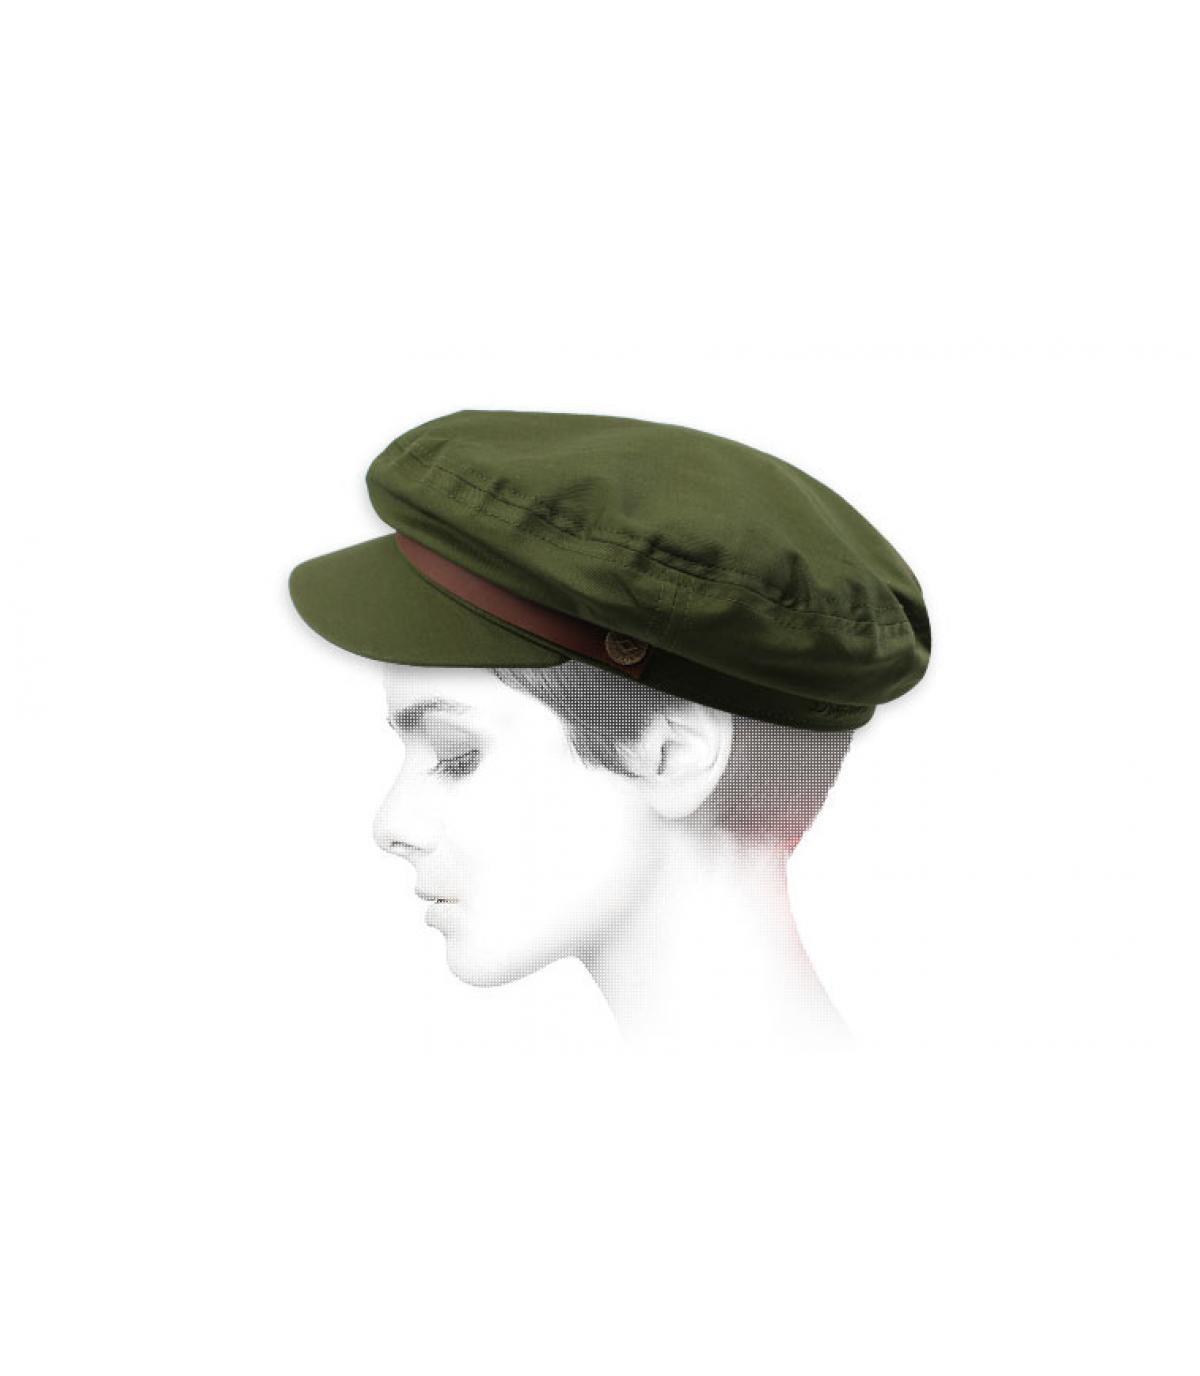 gorra marinera mujer verde